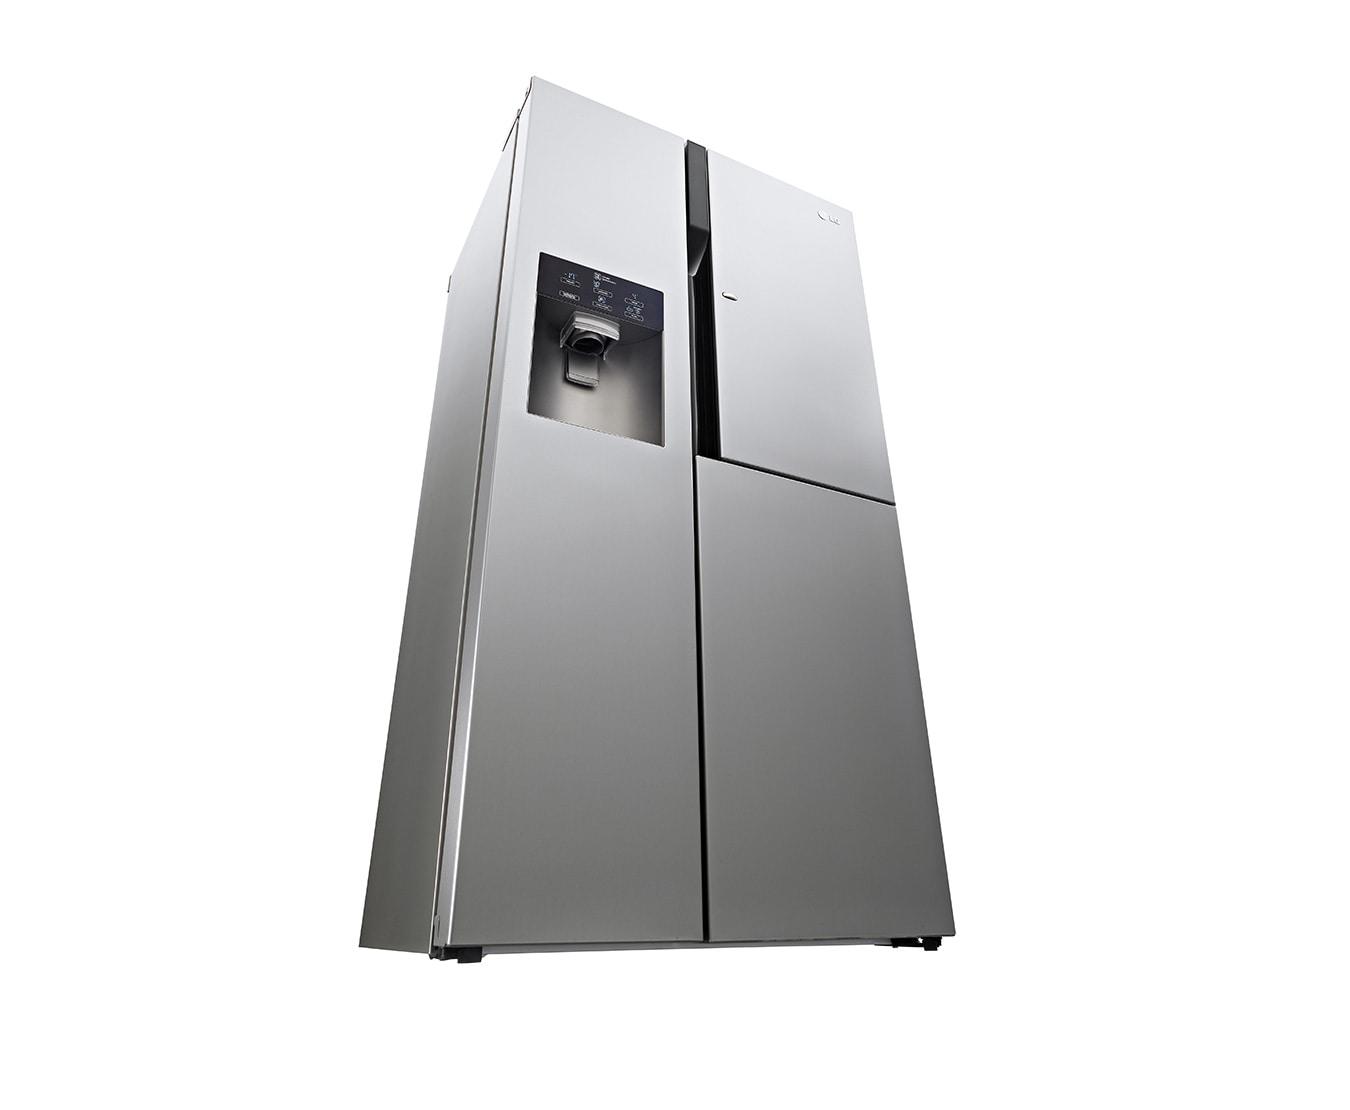 Kühlschrank Filter : Miele geruchsfilter kühlschrank austauschfilter zz online